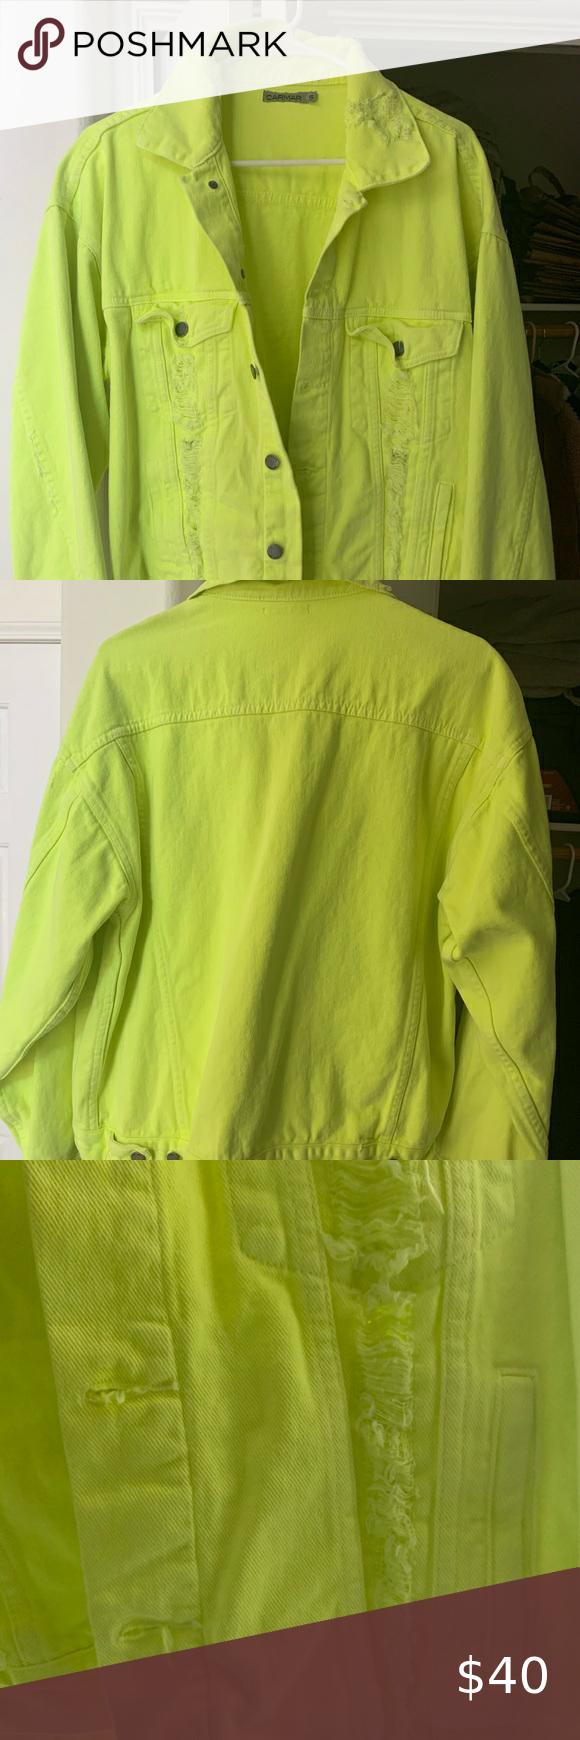 Neon Green Jean Jacket Lf Carmar Lime Green Jean Jacket Never Been Worn Lf Jackets Coats Jean Jackets Green Jean Jacket Green Jeans Jean Jacket [ 1740 x 580 Pixel ]